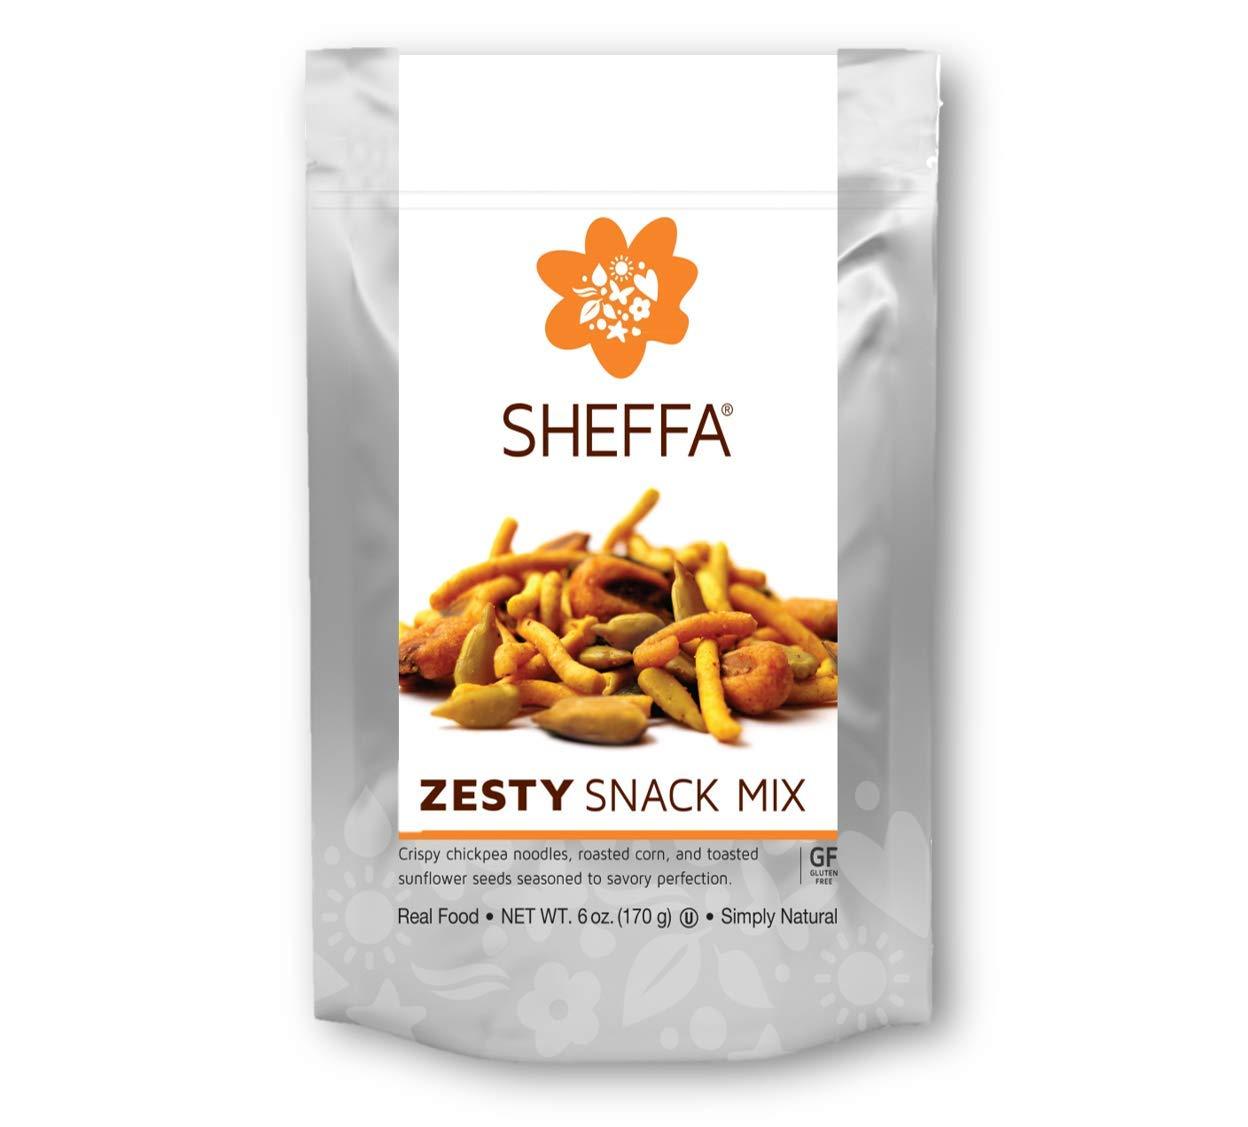 Sheffa Snack Trail Mix, Zesty Healthy & Tasty, 6 Oz (3 Pack) Vegan, Kosher, Gluten Free, Non Gmo, Low Sodium. for Busy Working People